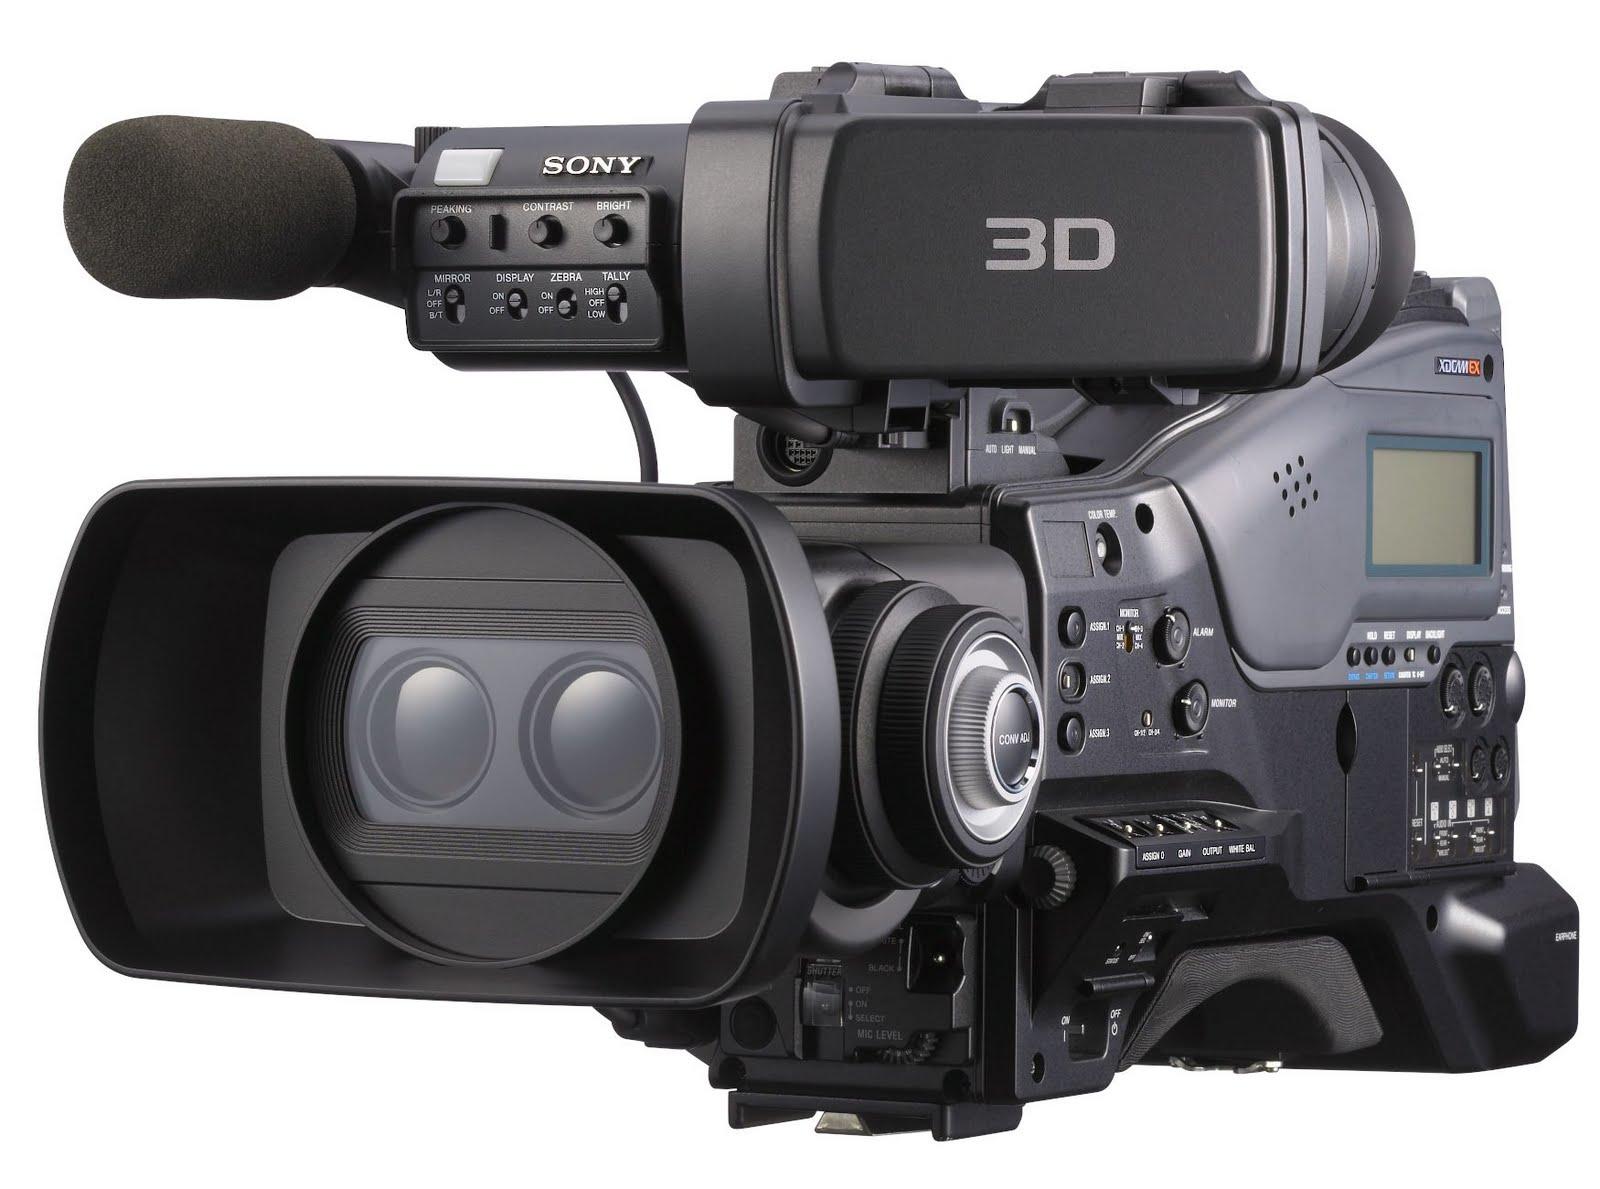 http://4.bp.blogspot.com/-kLWcH0DWJME/TaM4PEgSXnI/AAAAAAAABeU/GaBCPzmuMhQ/s1600/Sony%20PMW-TD300%203D%20camcorder.jpg